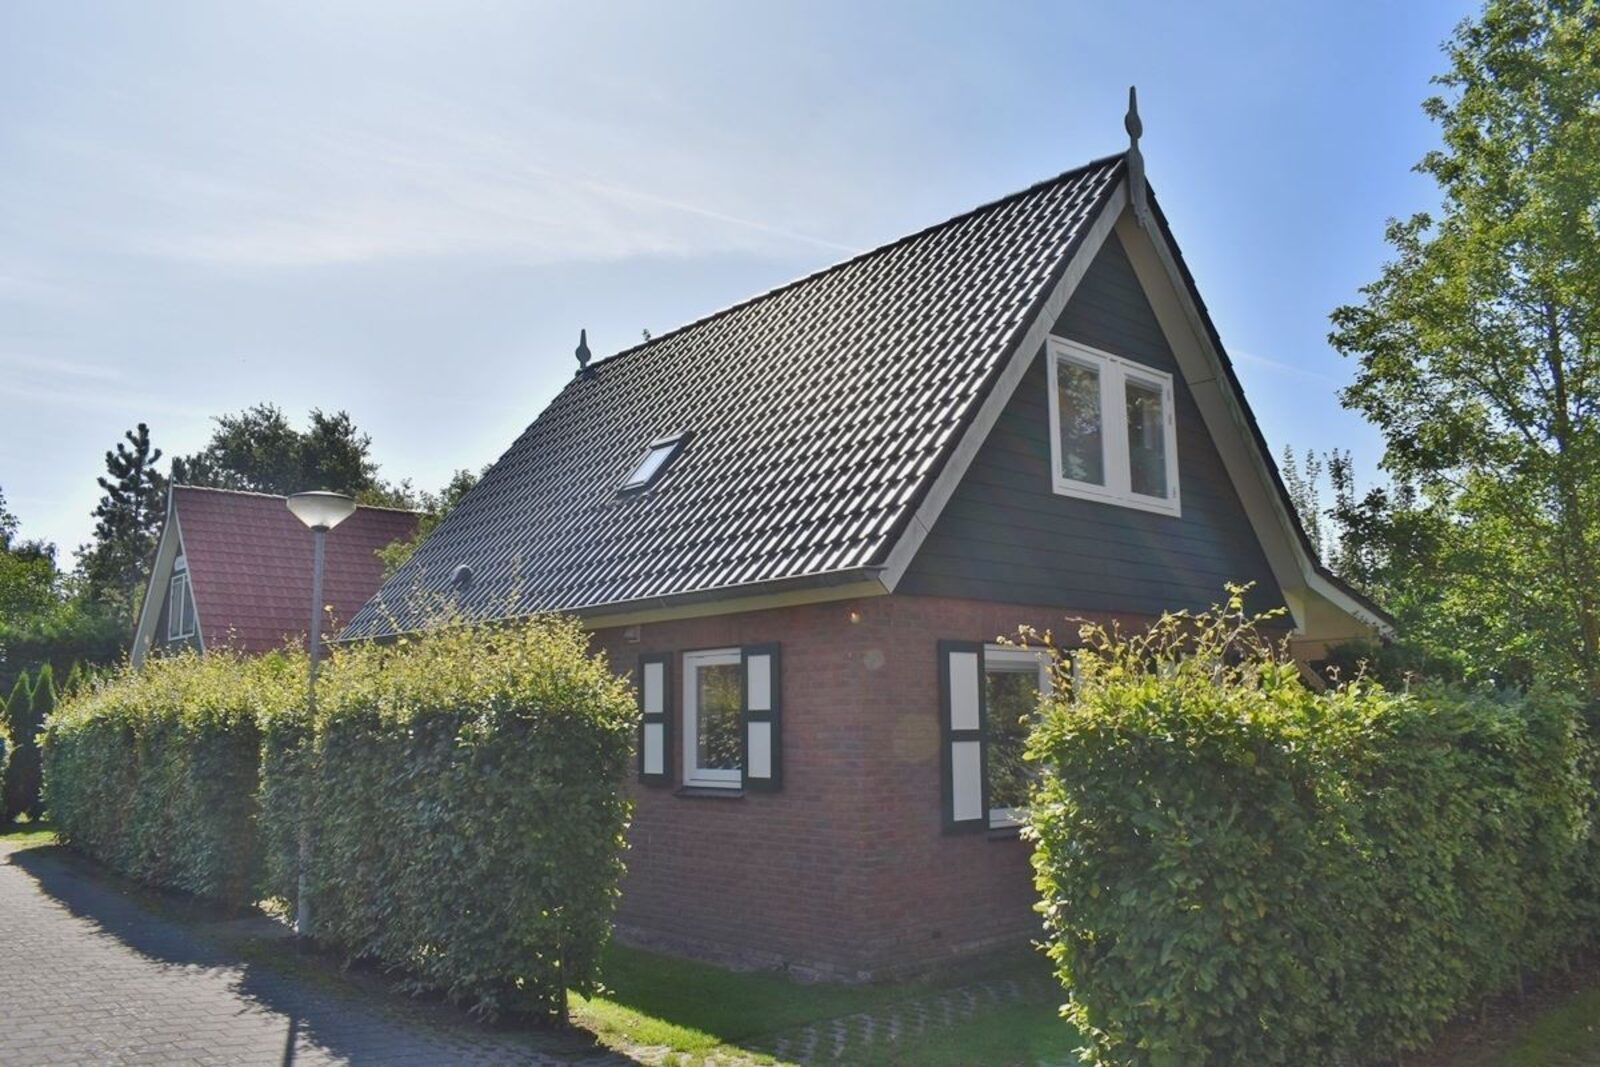 Holidayhouse - Zuidweg 18 | Zonnemaire 'Park Viletta huisje 28'